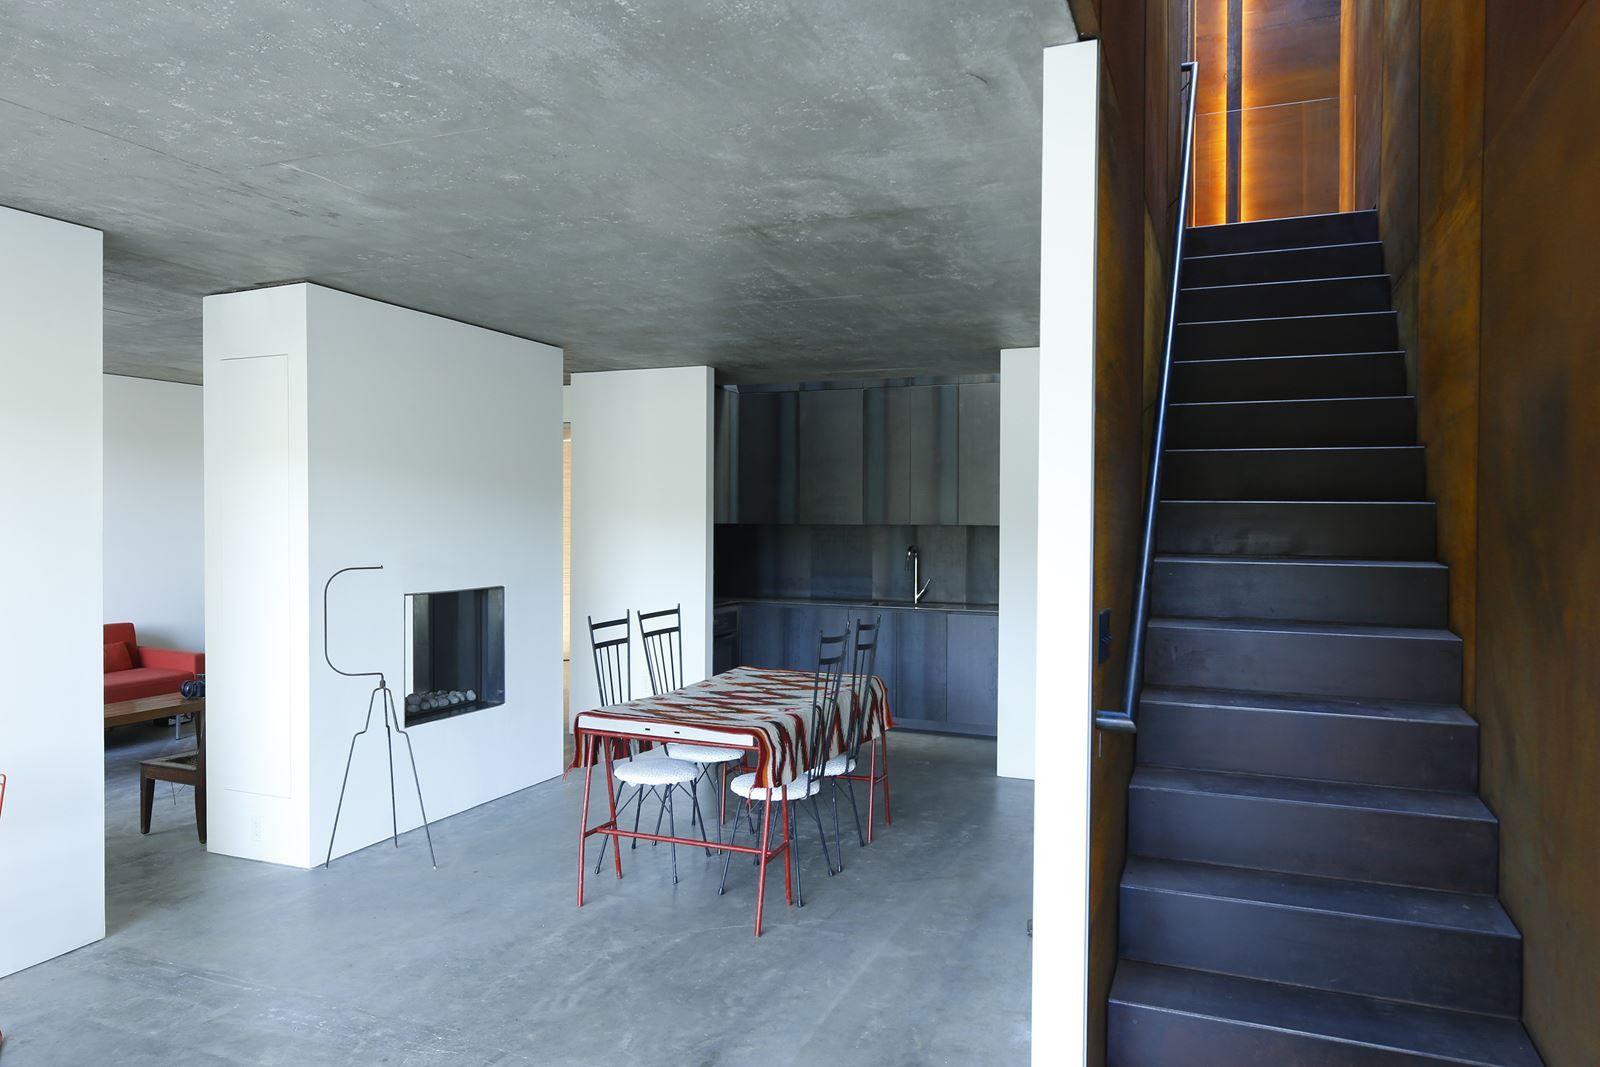 Lake House - Picture gallery #architecture #interiordesign #kitchen #concrete #staircase